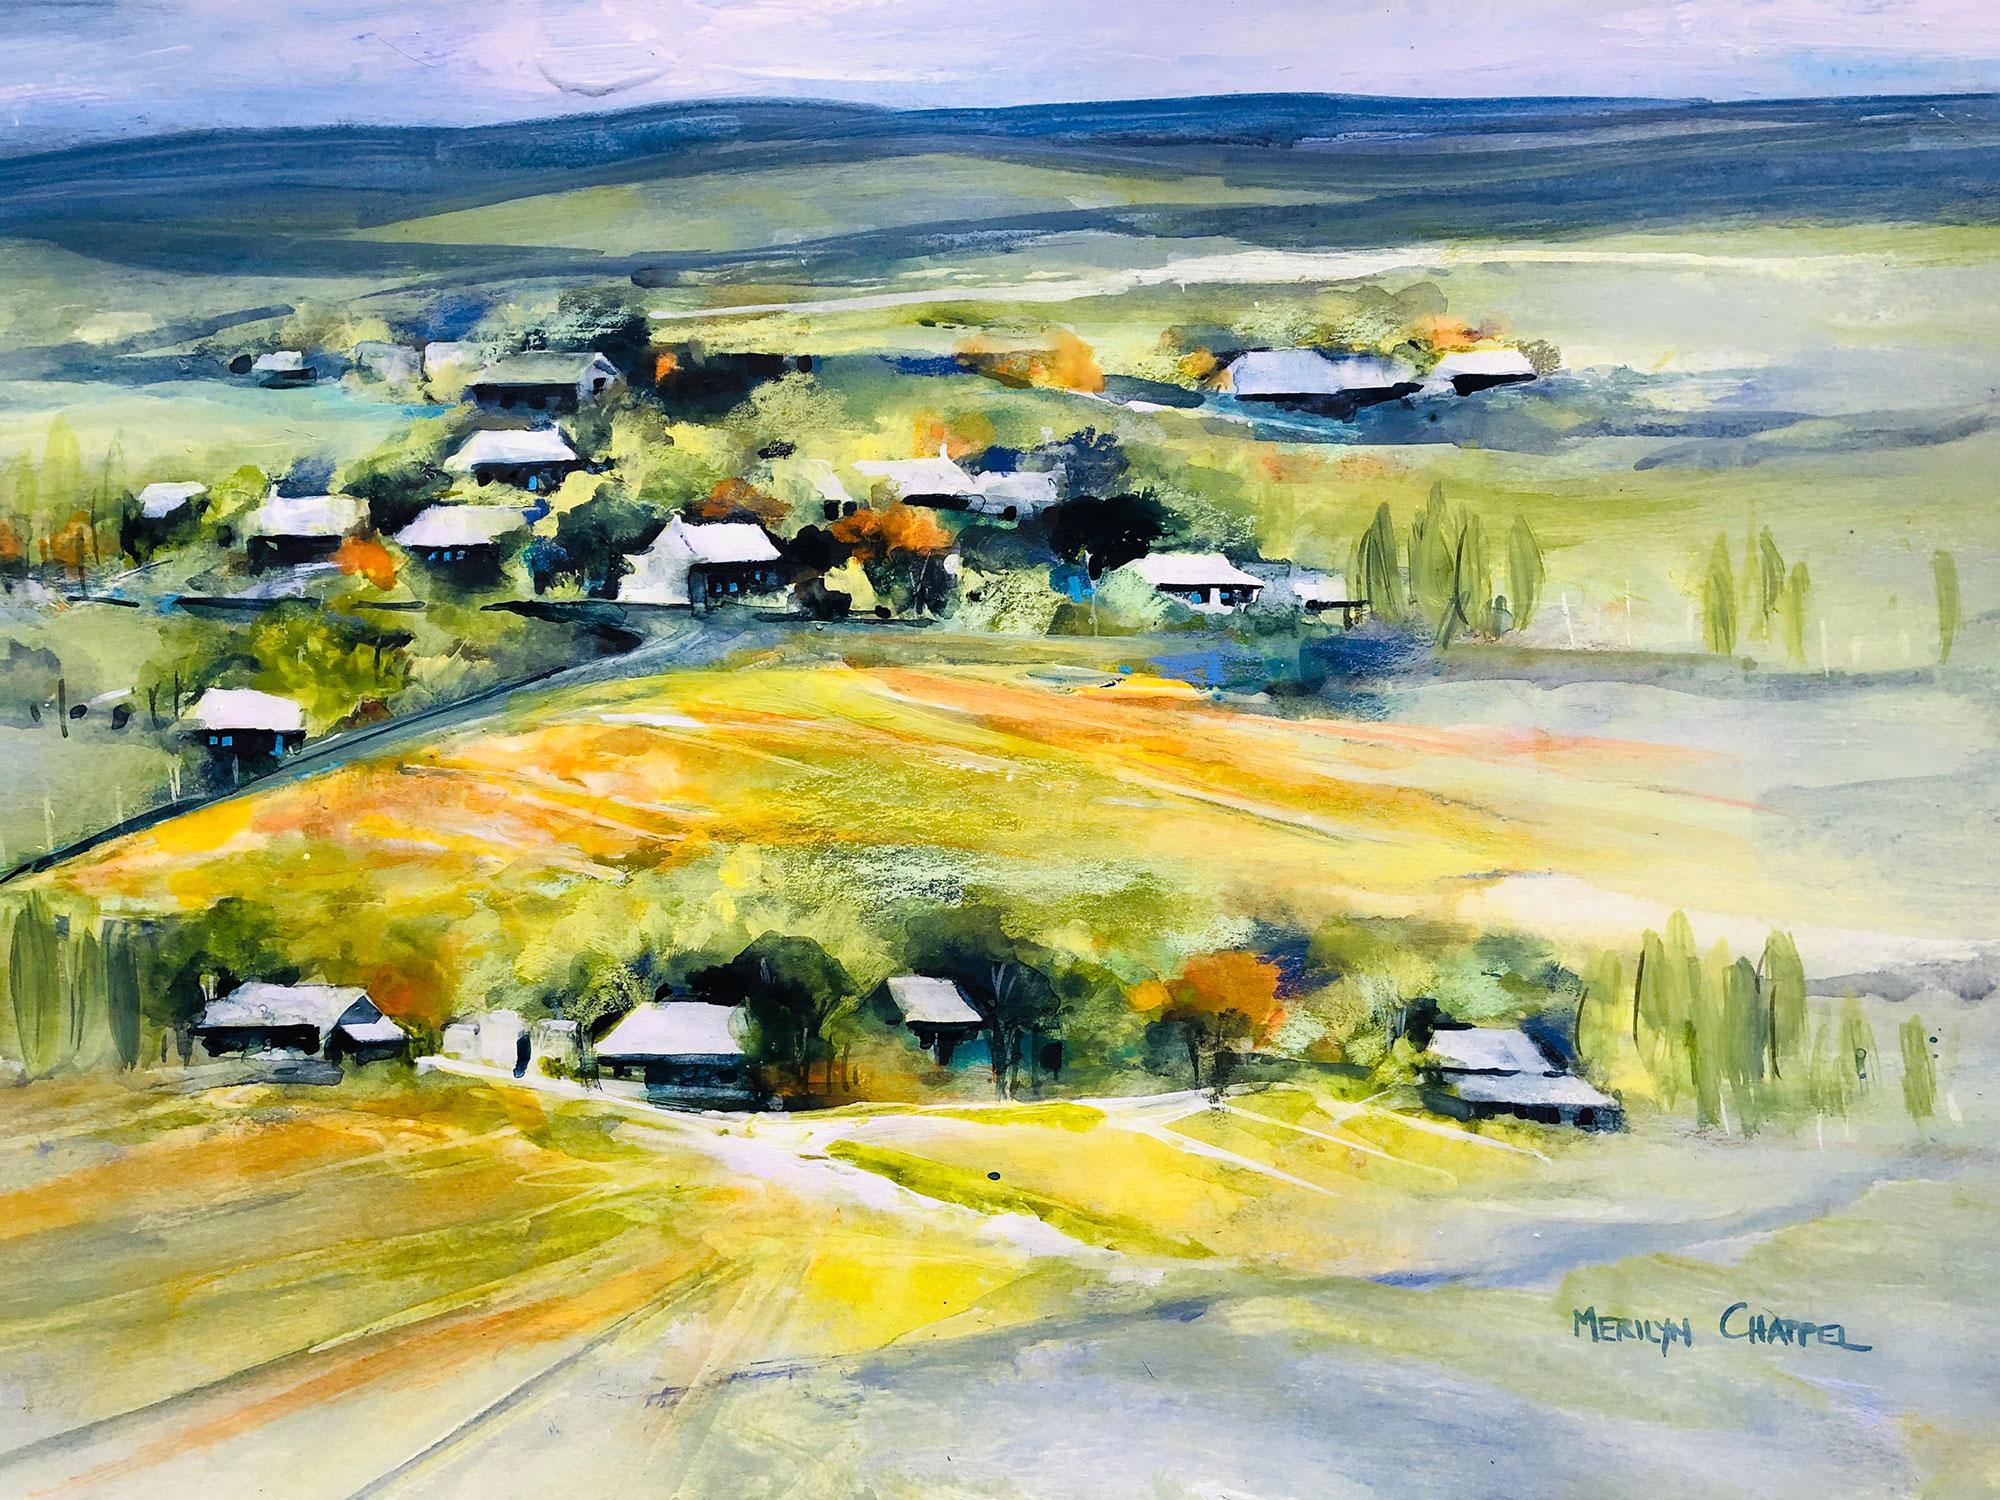 Summer-fields-of-canola